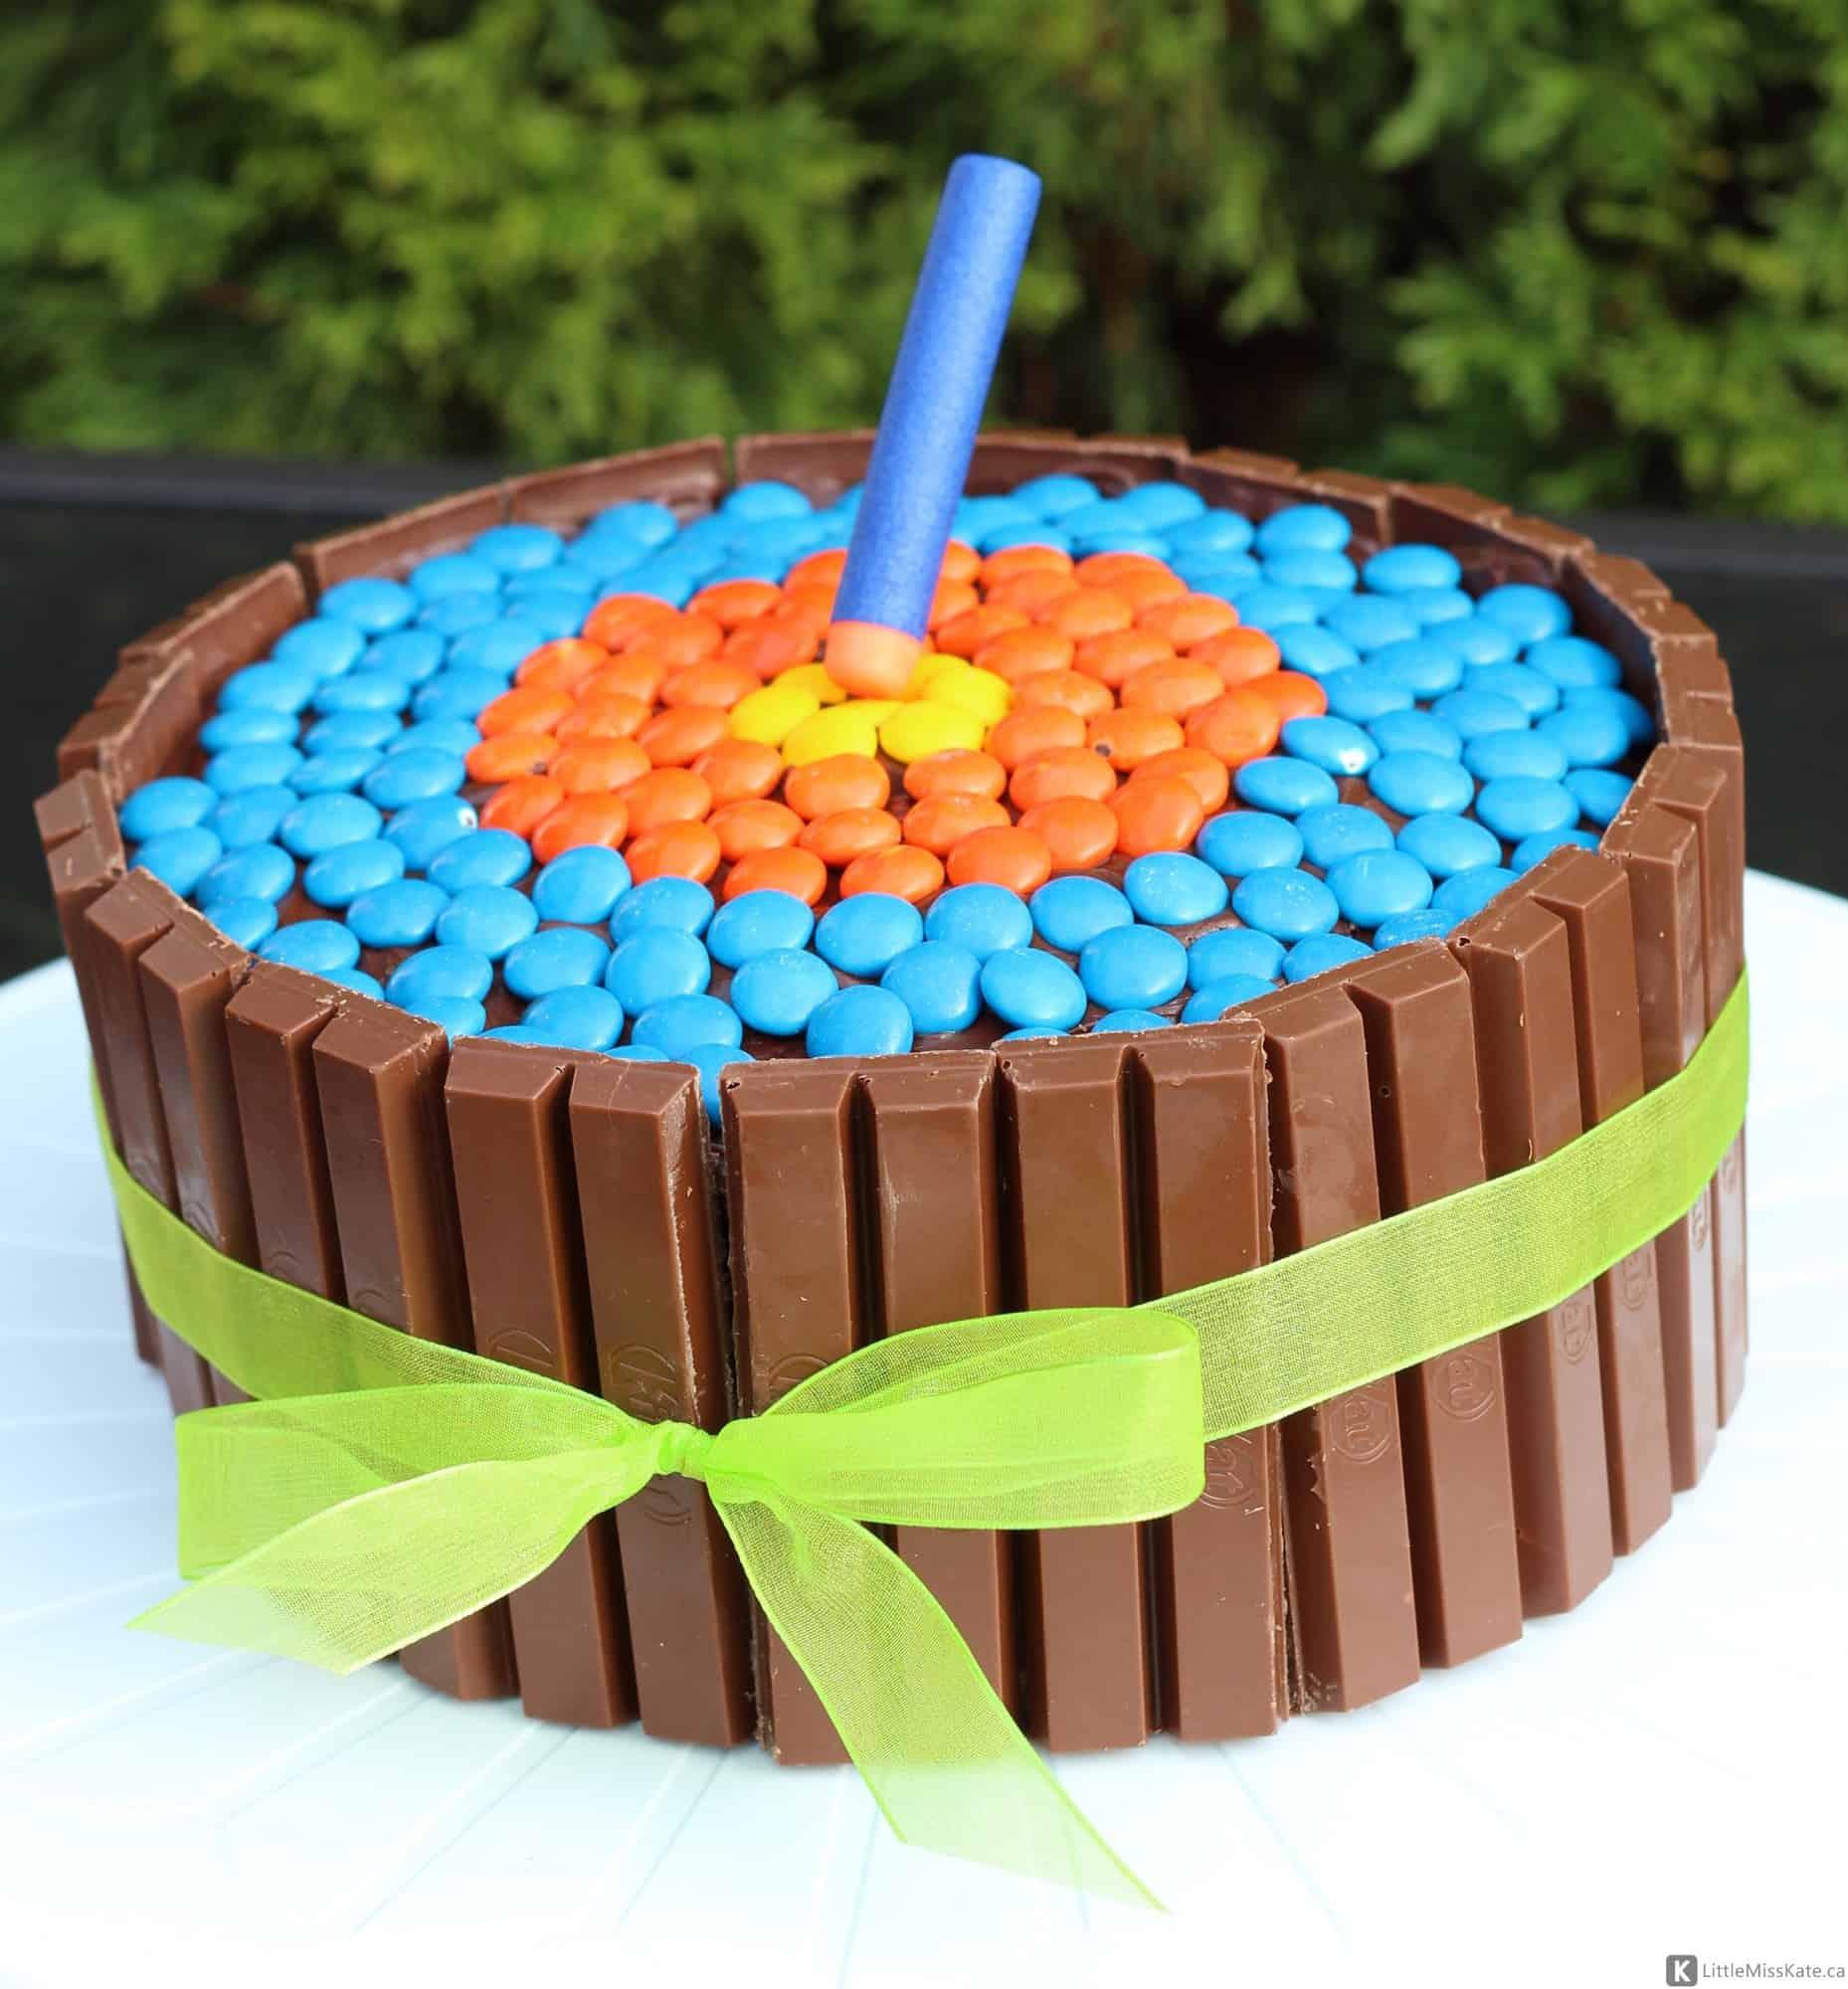 How to Make an Easy Nerf Gun Cake idea cake mix birthday cake kit kat cake